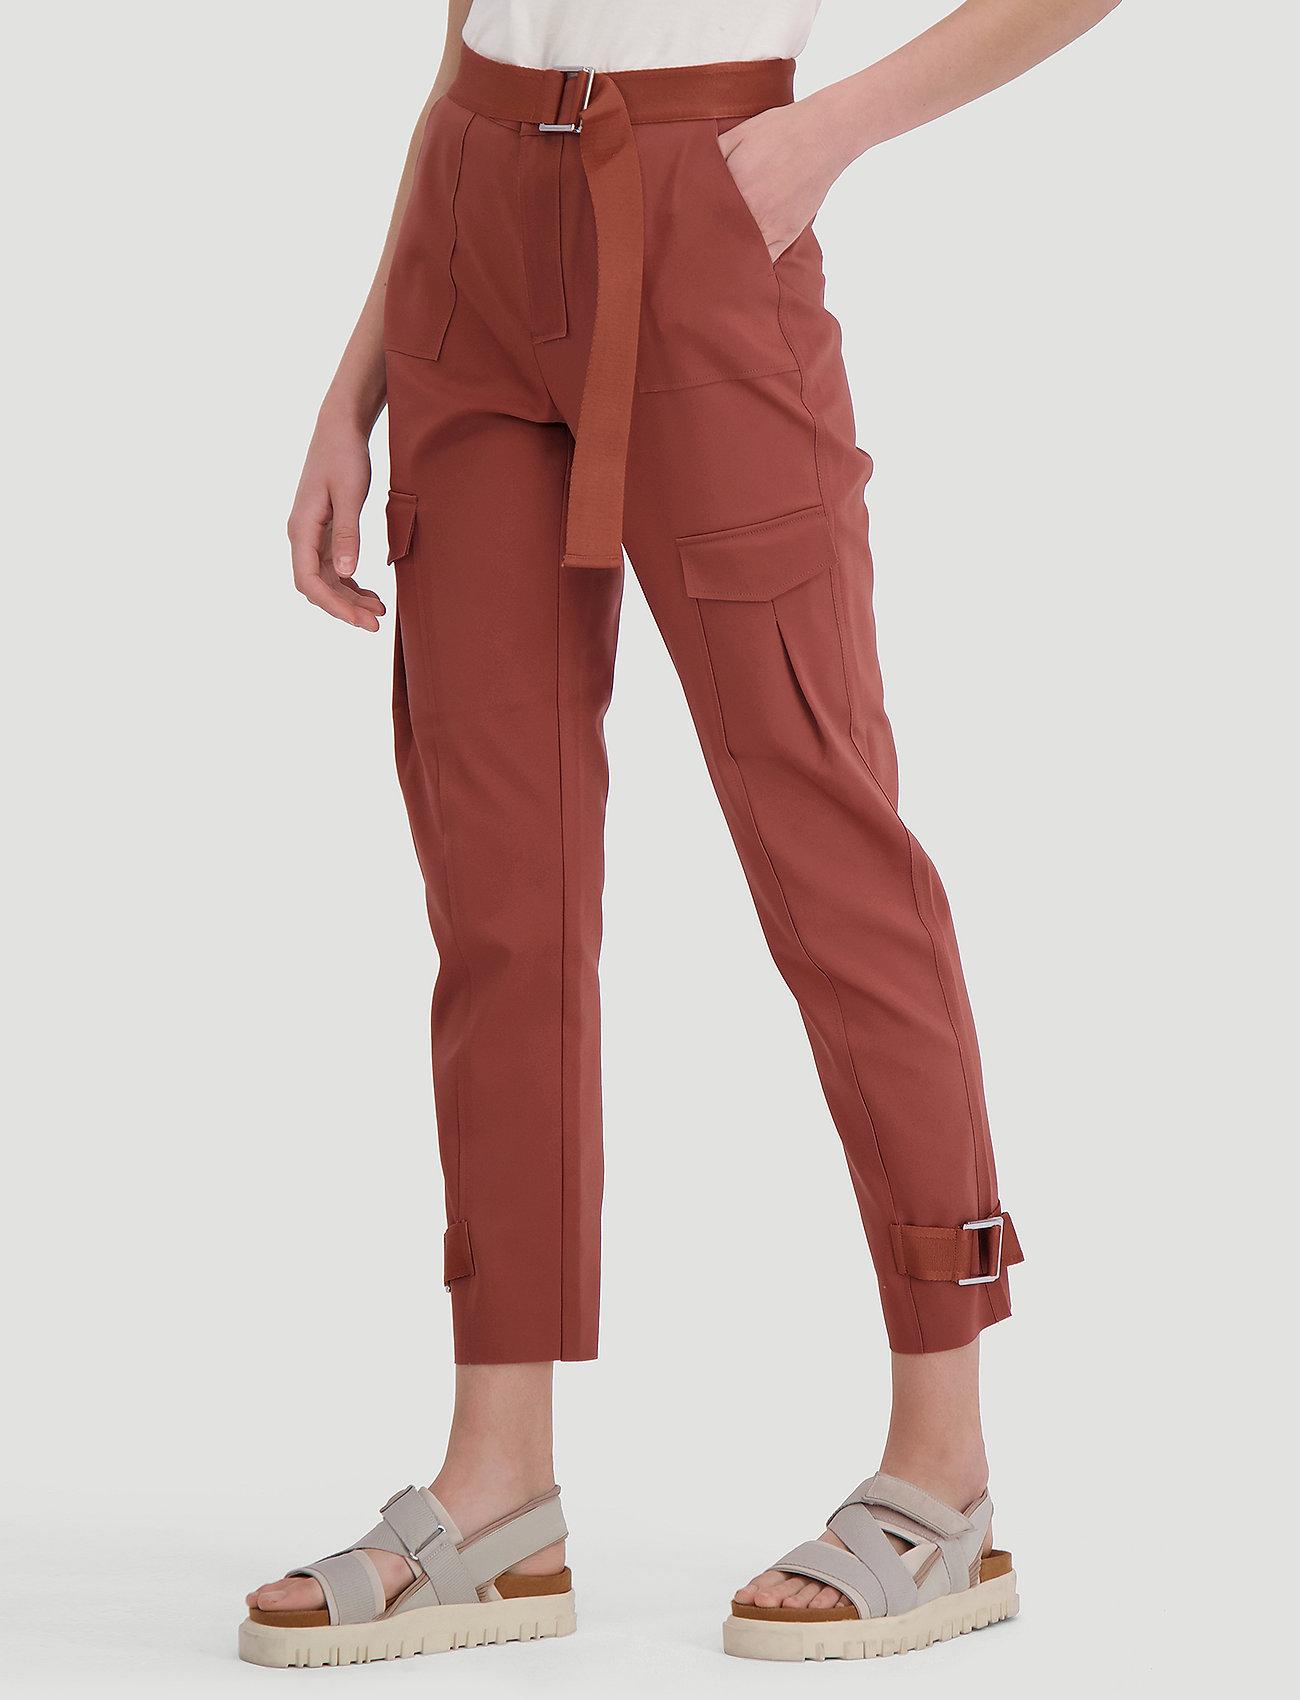 Skunk Trouser   - HOLZWEILER -  Women's Trousers Online